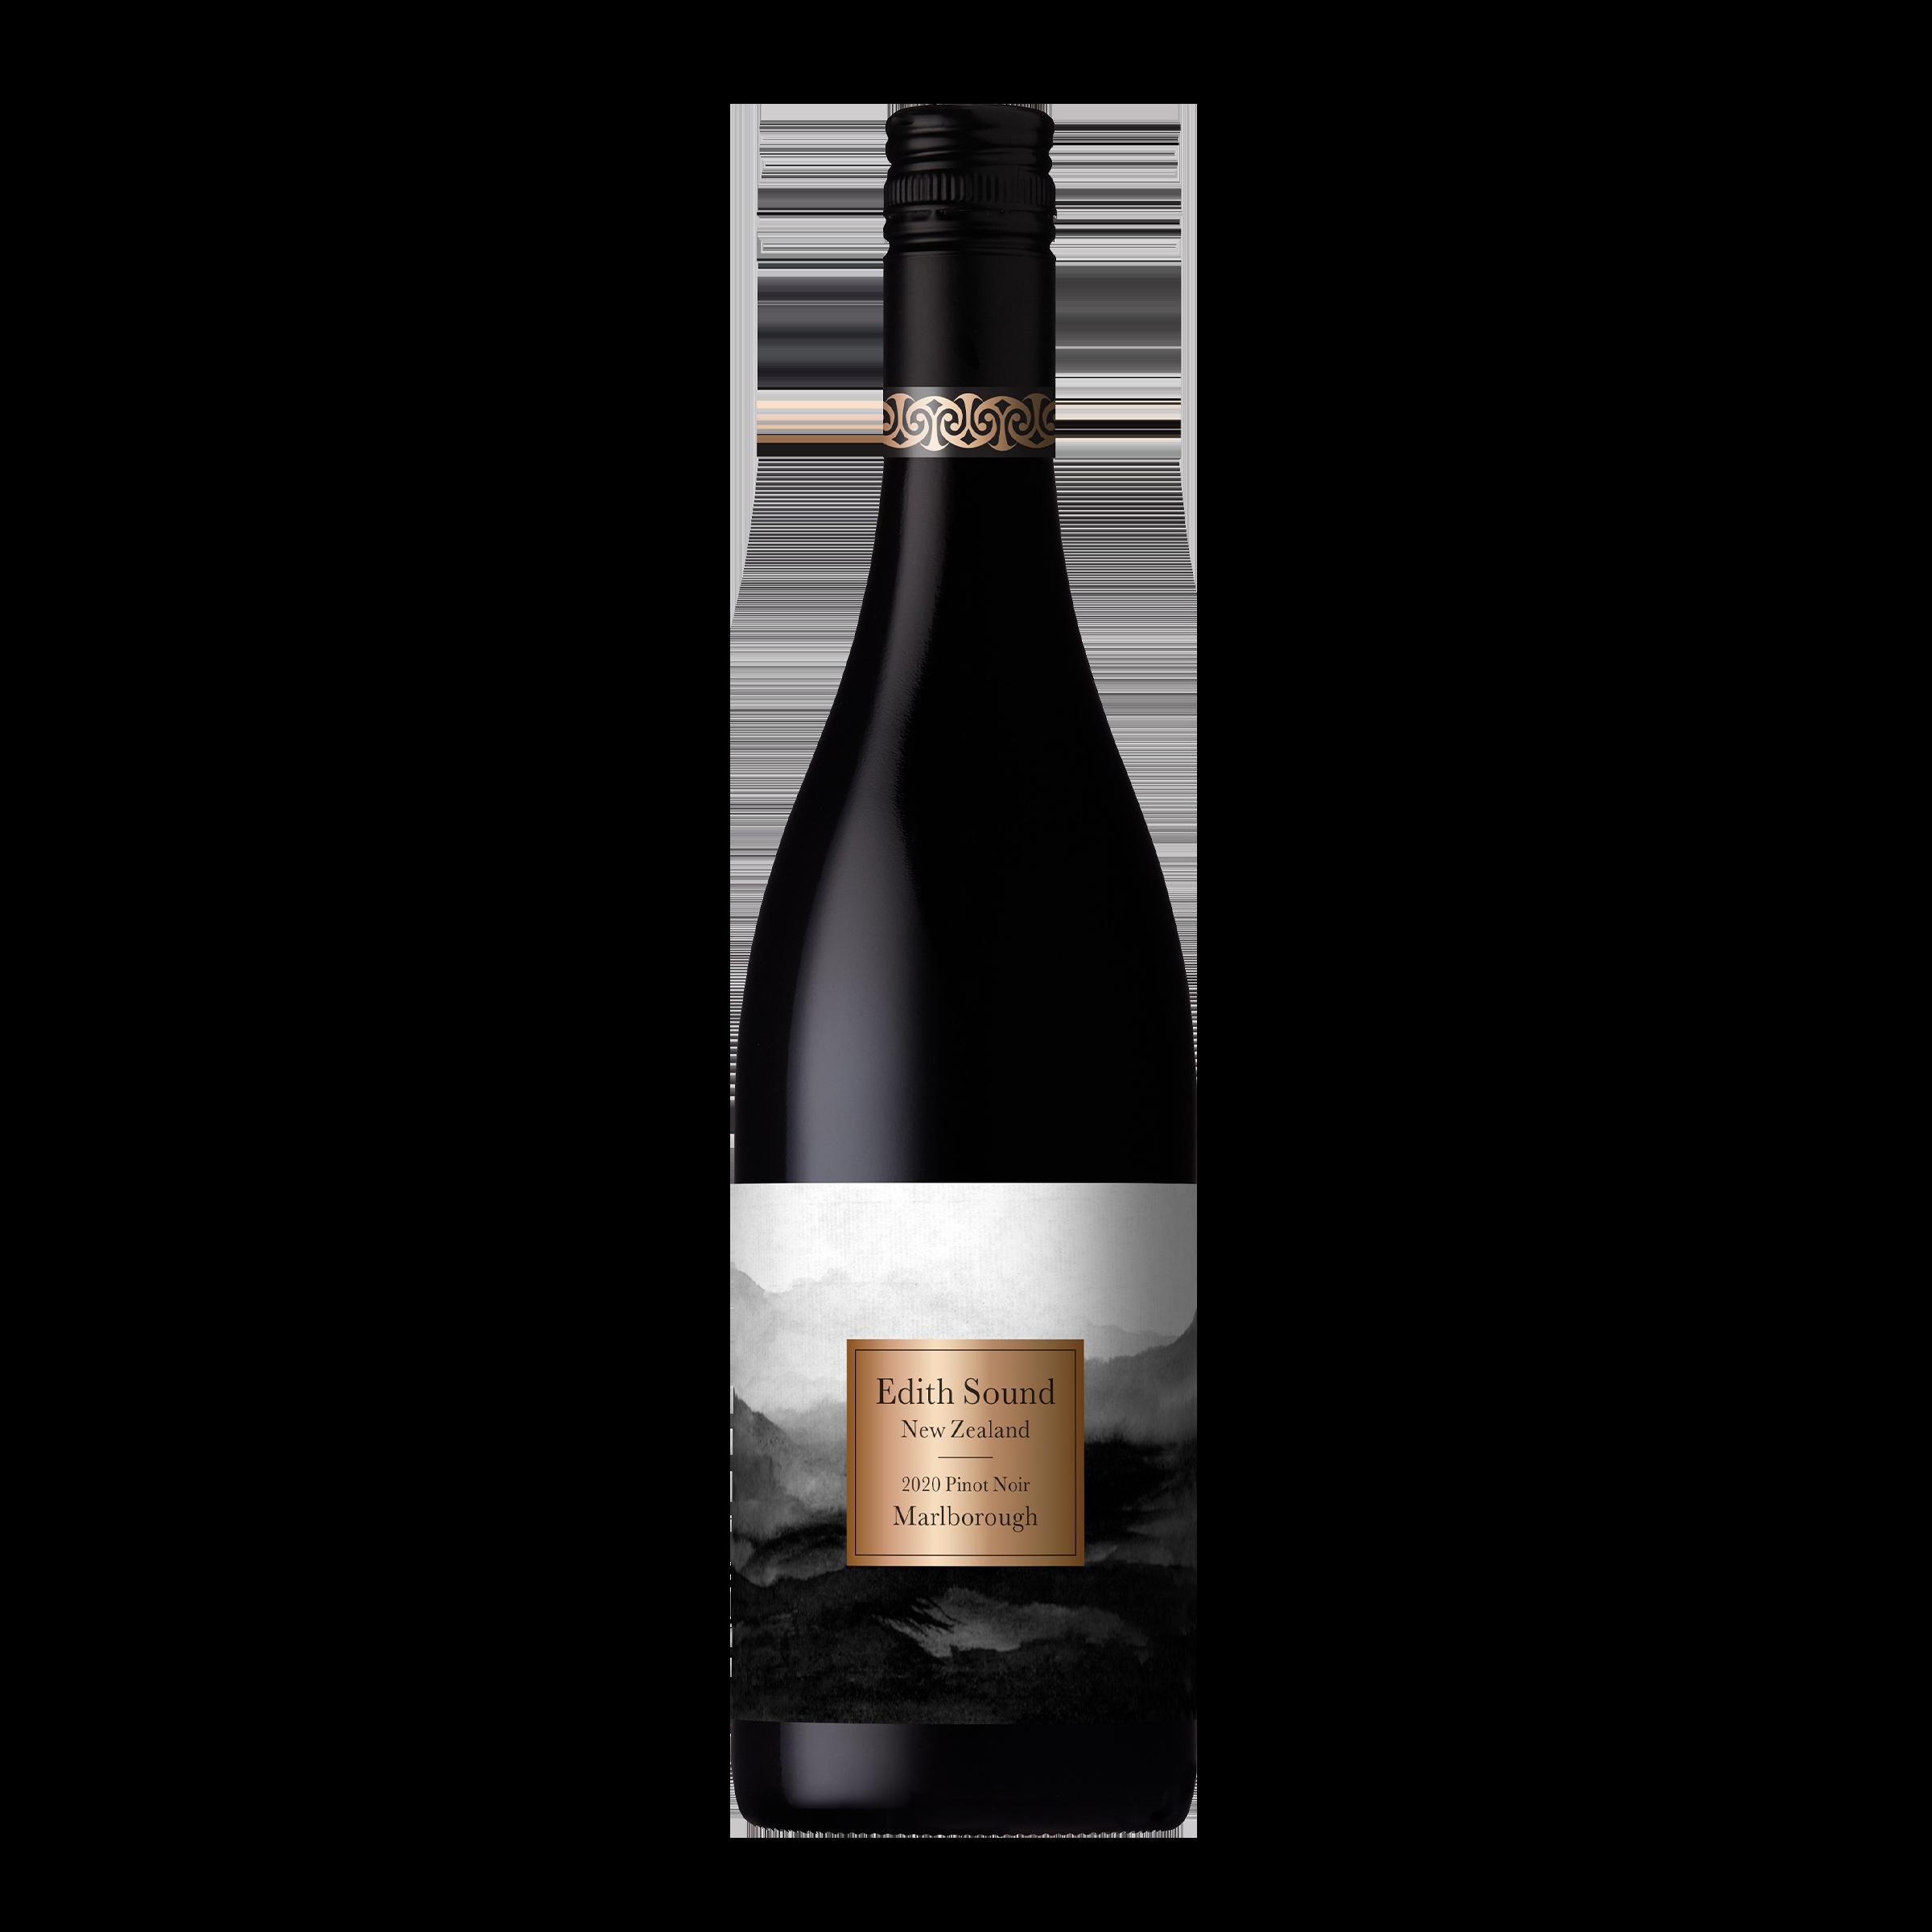 Edith Sound Pinot Noir